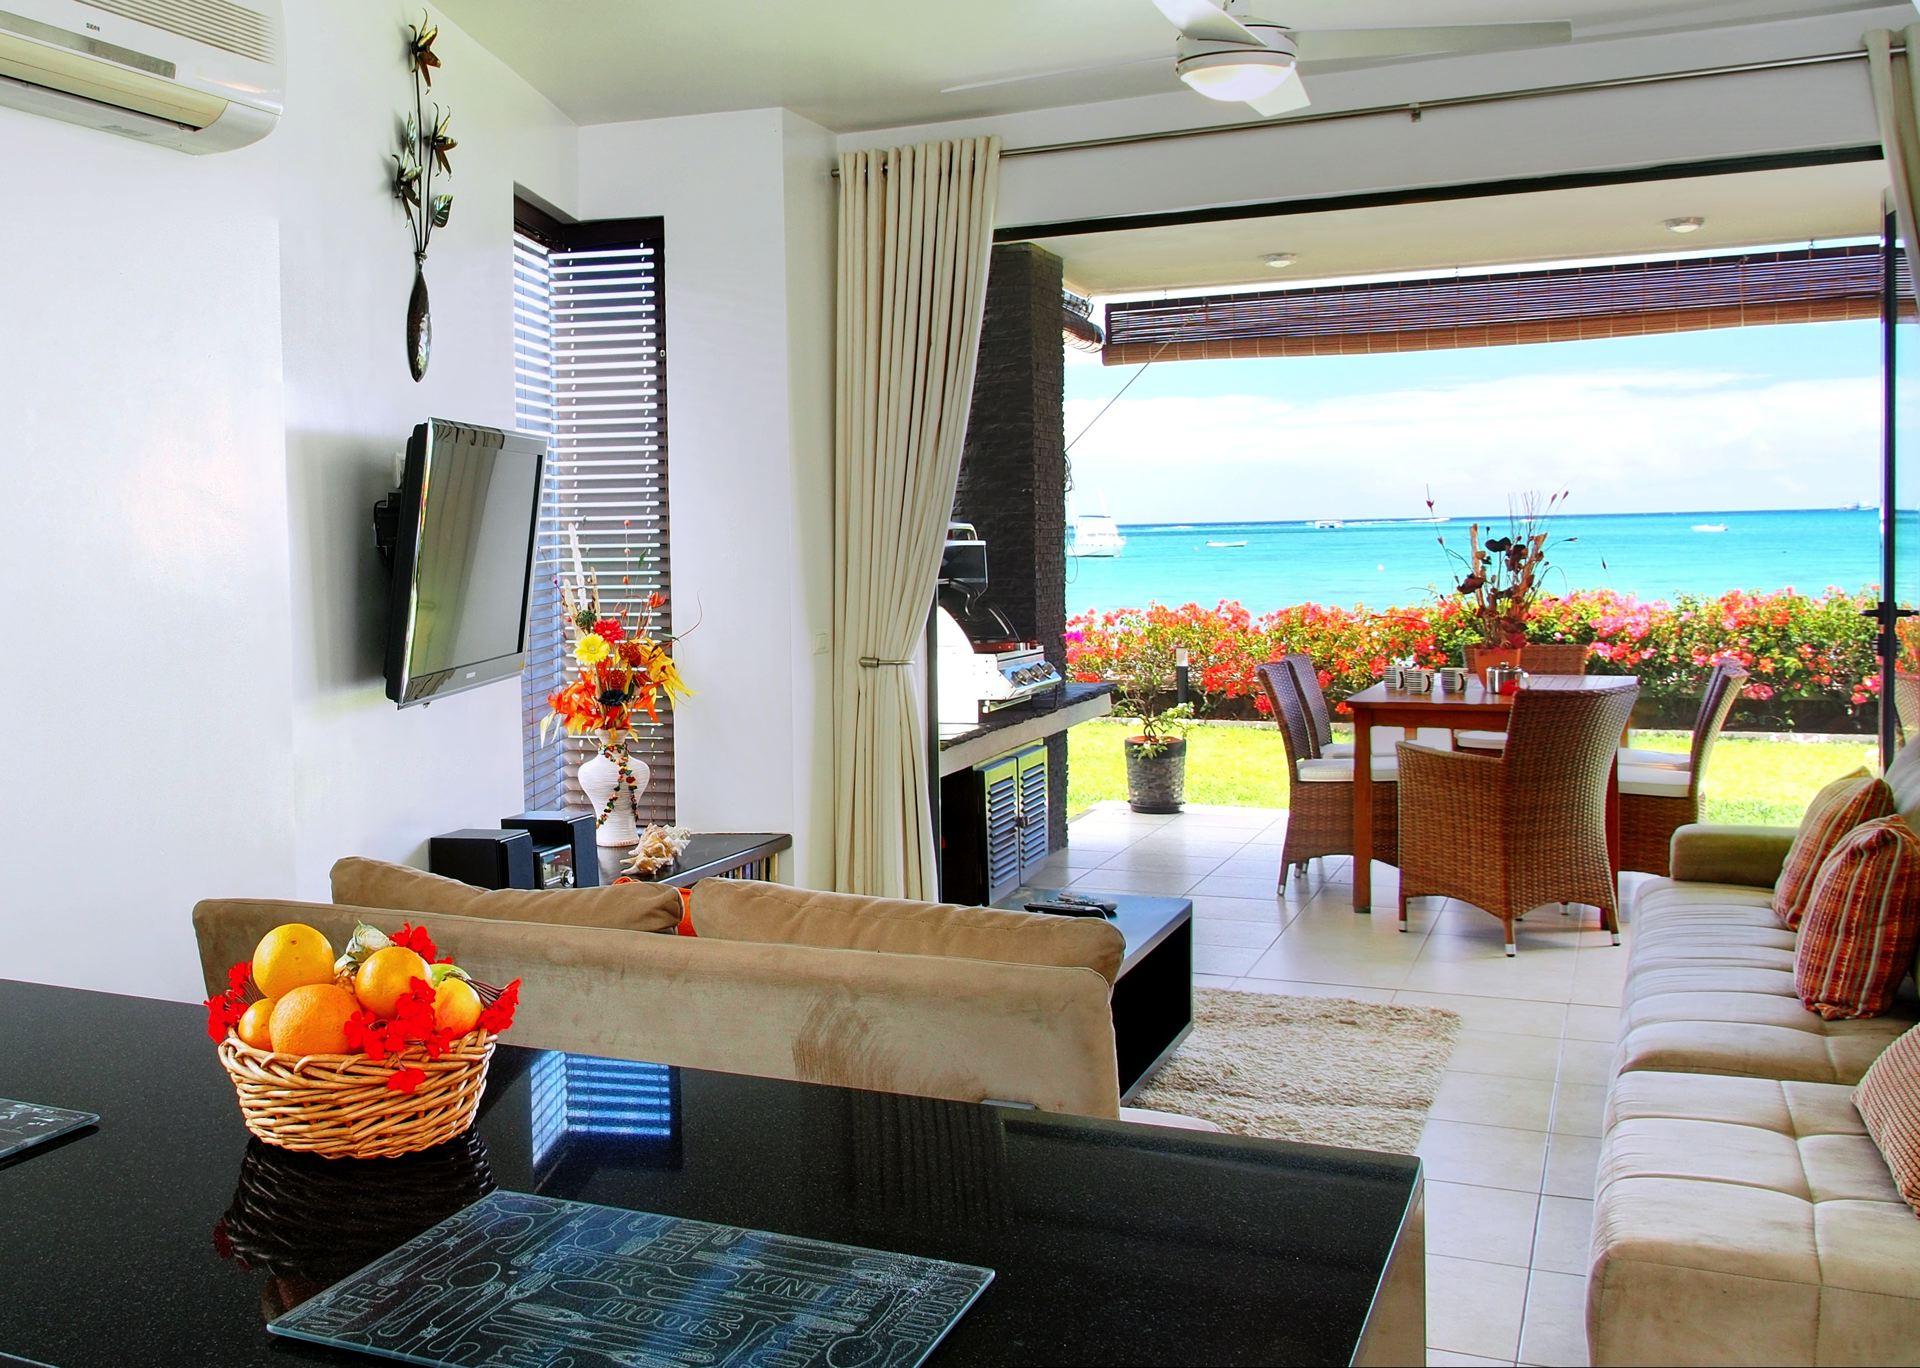 Lov. Le Cerisier Beach Apartments & Penthouses - Kitchen a~1.jpg